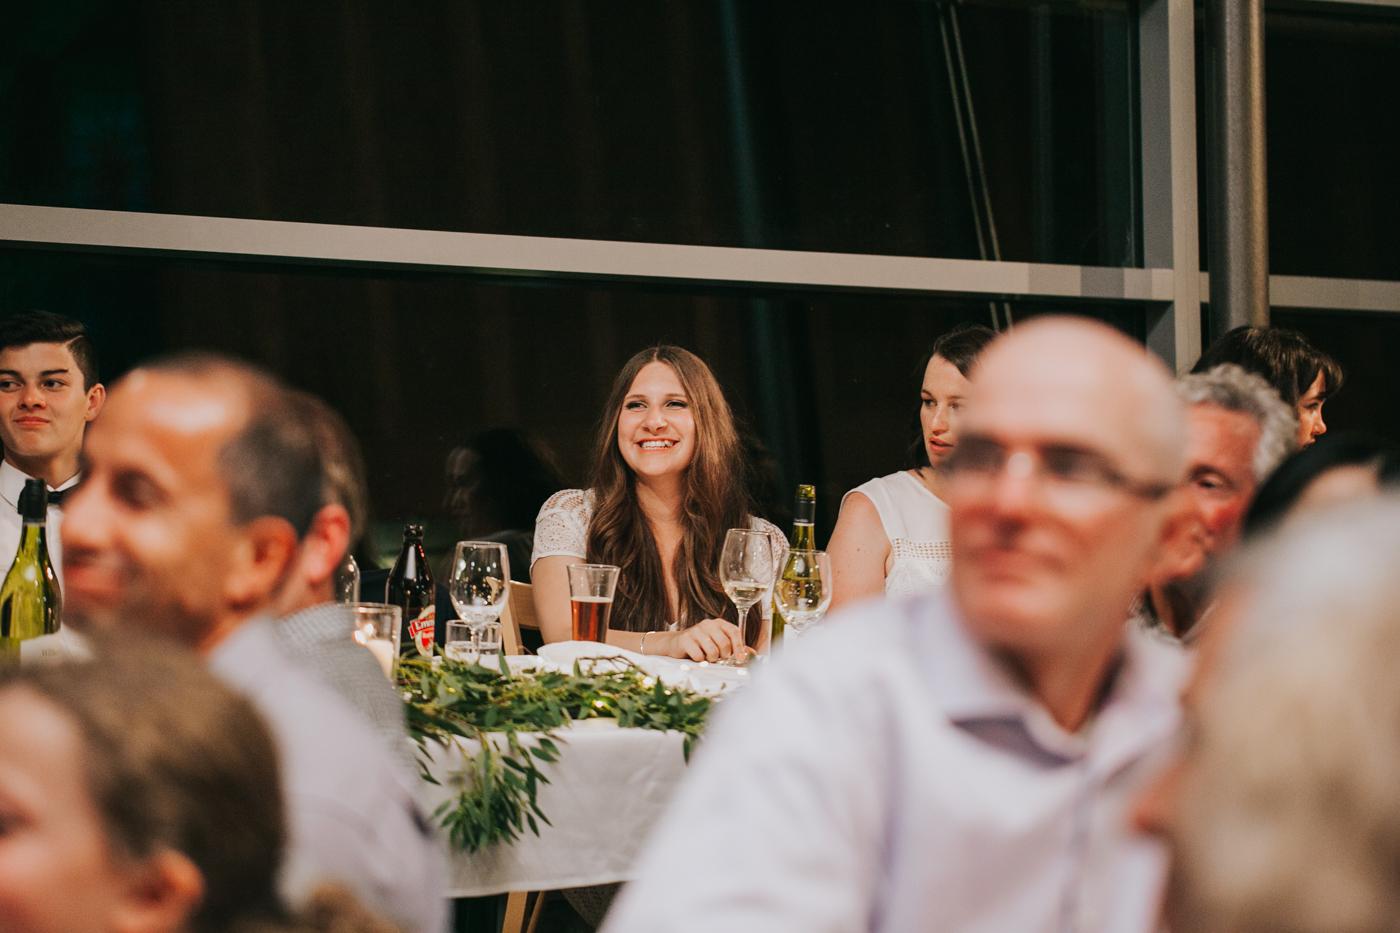 Ariana & Tim - Dunedin, New Zealand Wedding - Destination Wedding - Samantha Heather Photography-278.jpg